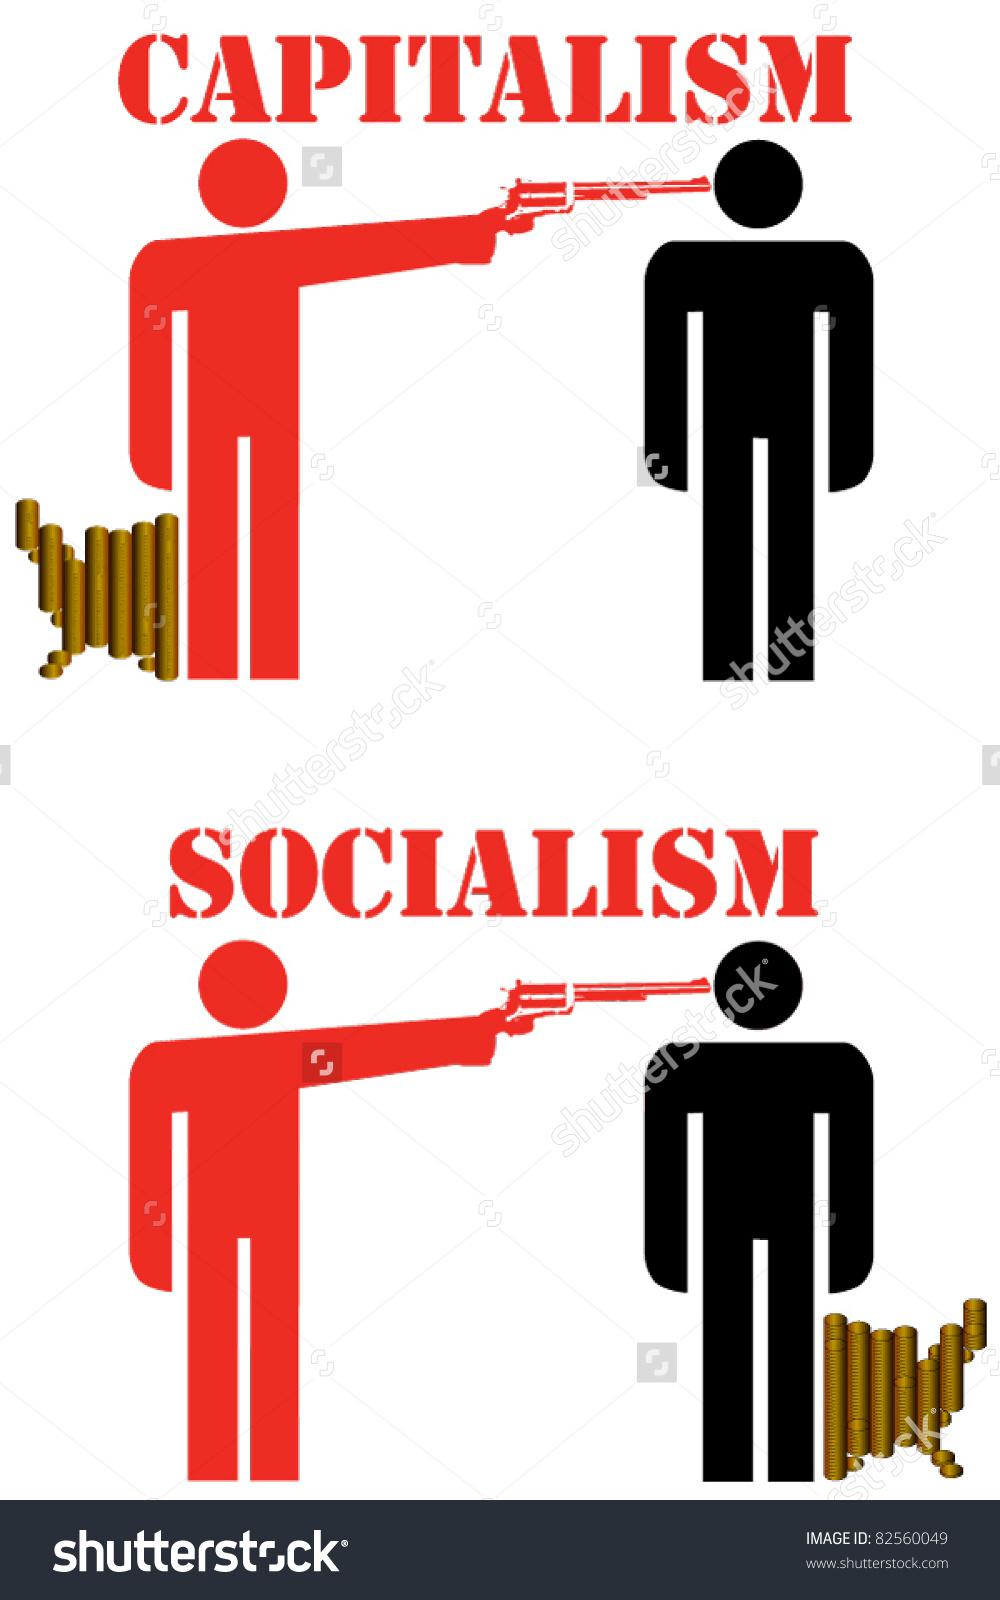 Capitalism Socialism Stock Vector 82560049.